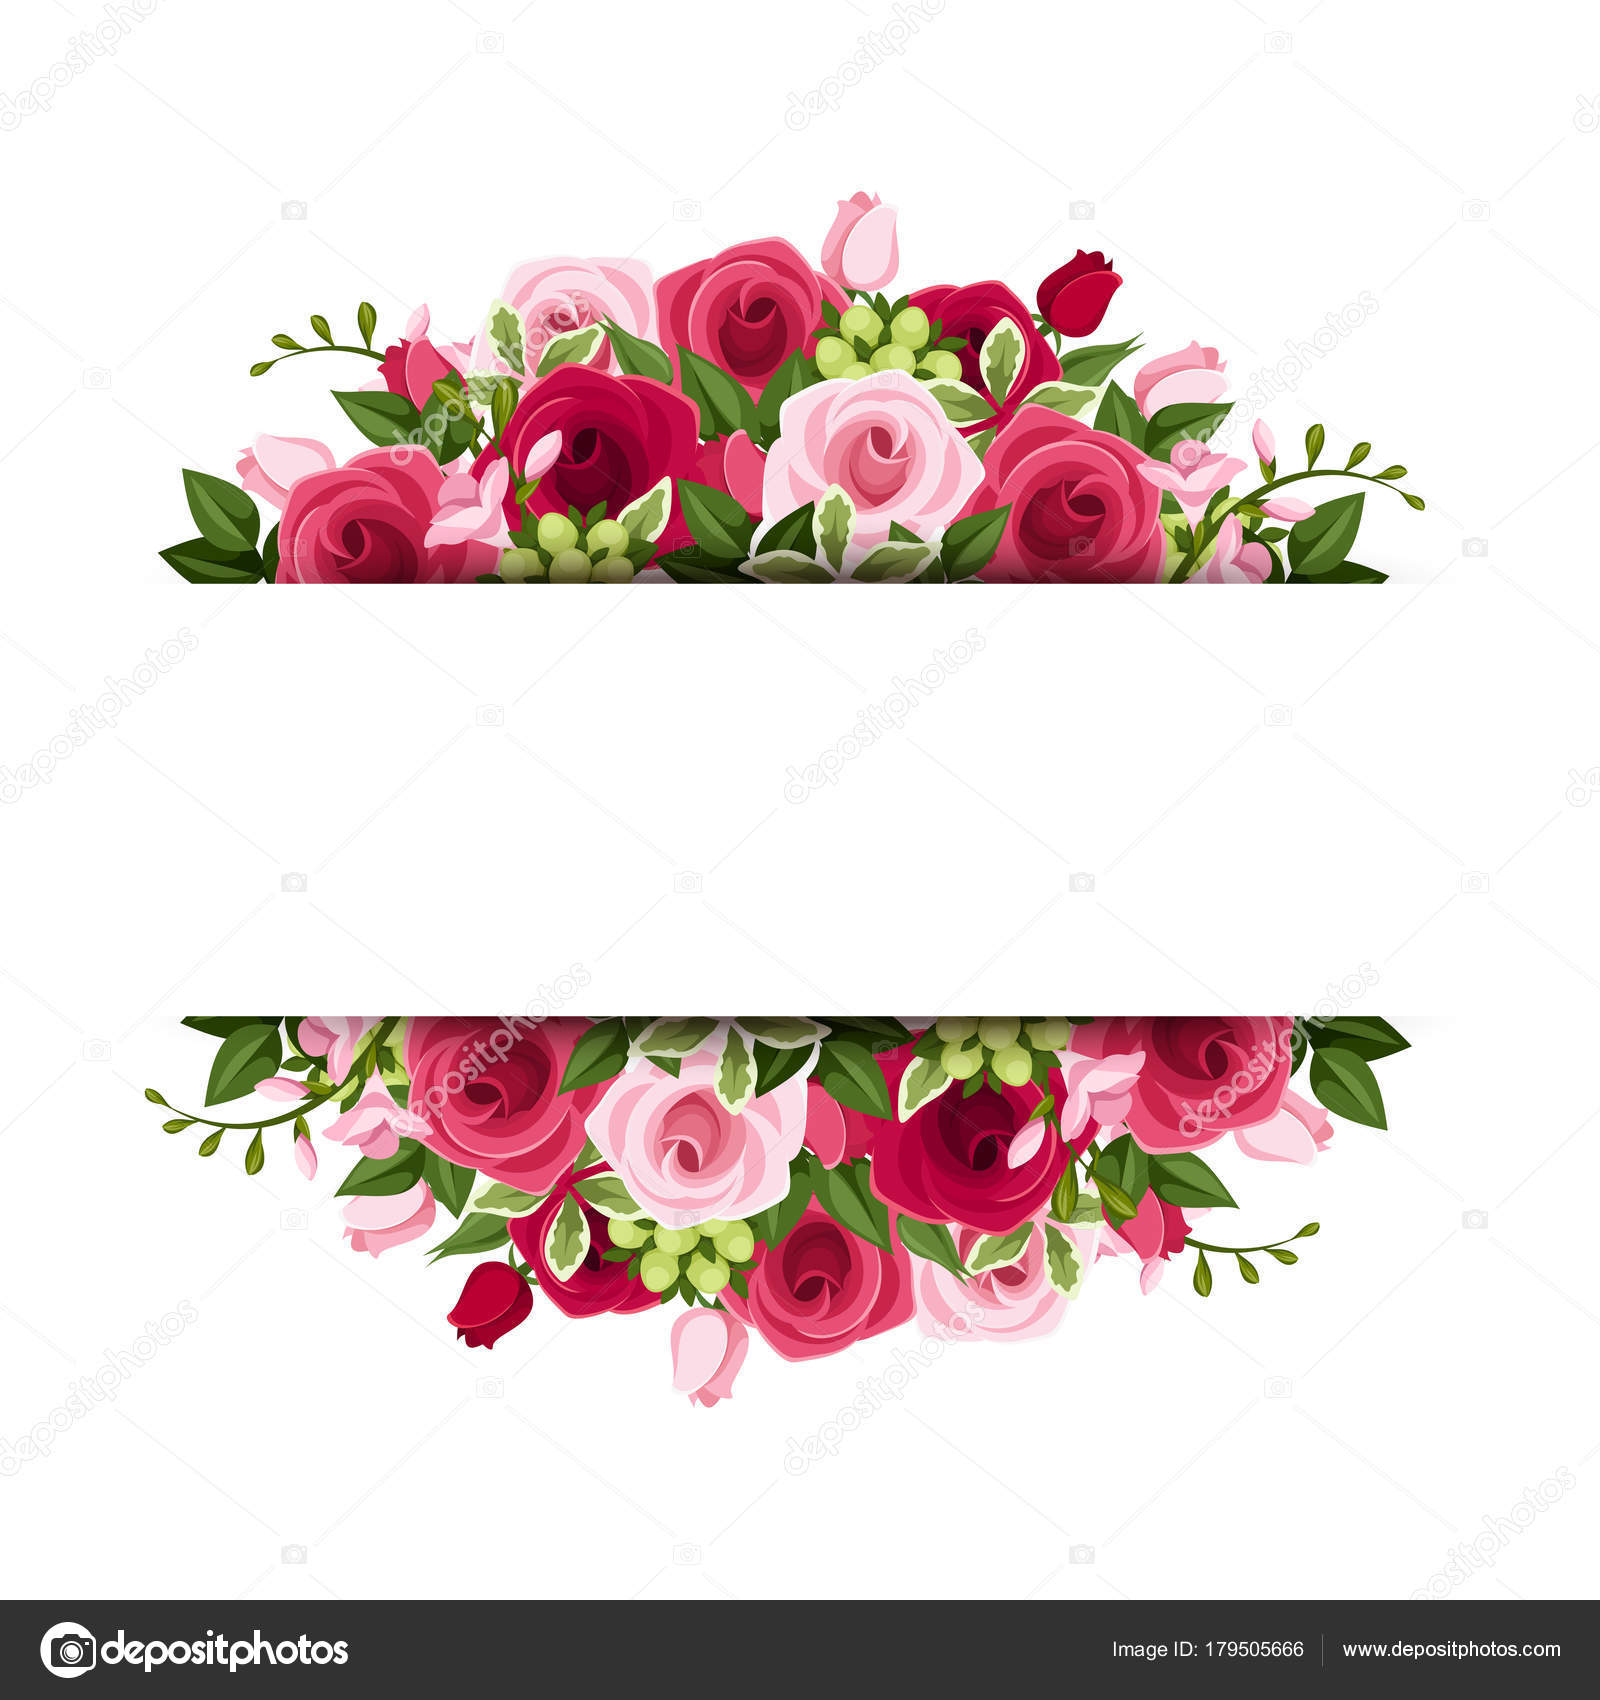 banner vetor com rosas vermelhas cor rosa fr u00e9sia flores vector rose pattern vector rose border